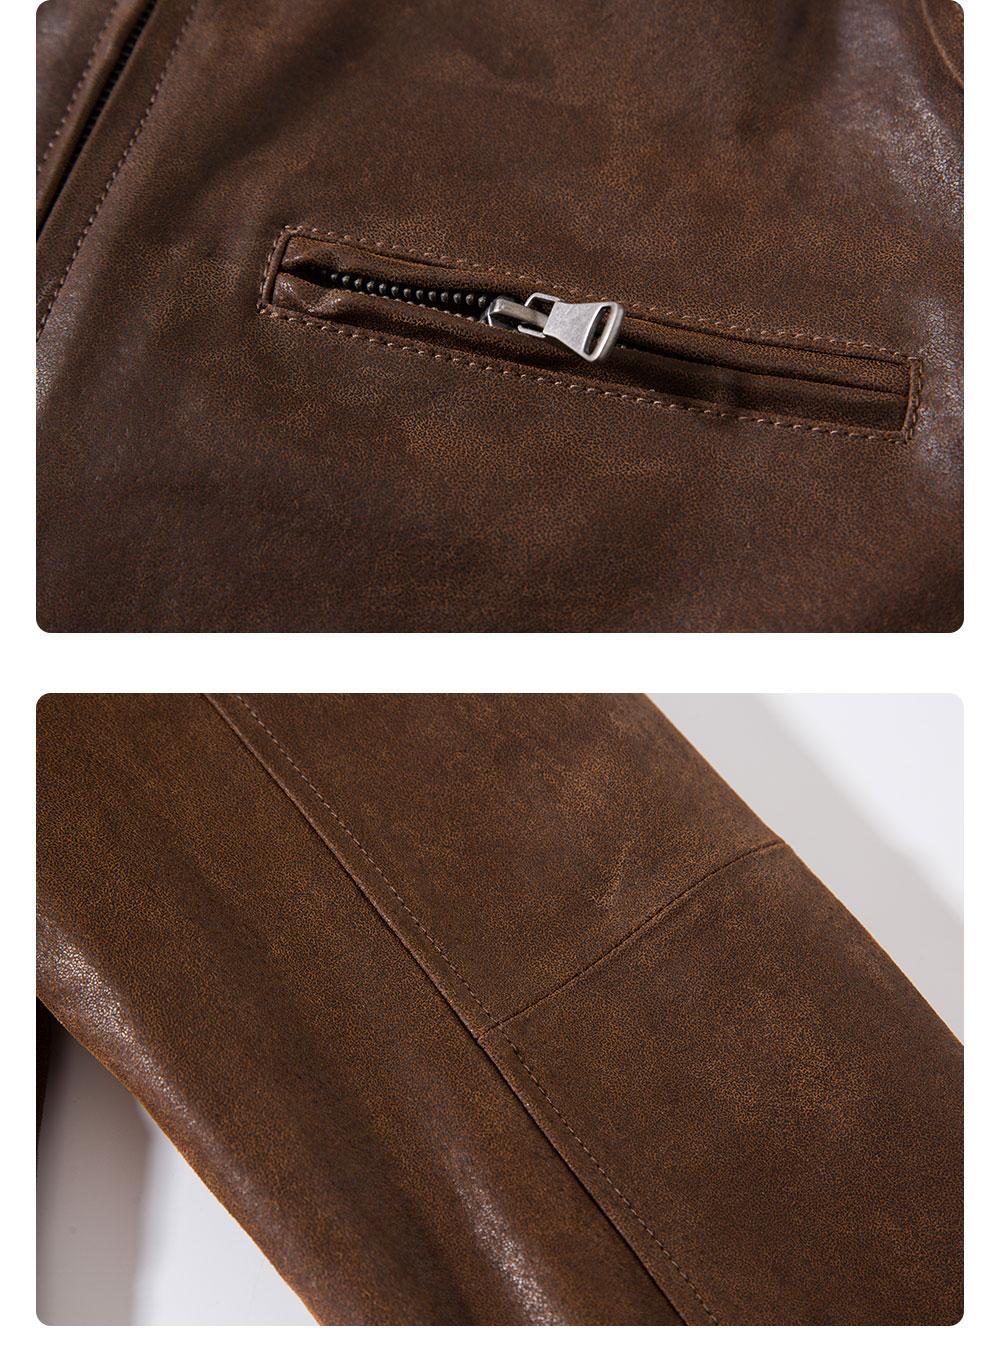 H718455f51dfa409f98b2c8ea78f5f6dad Men's Pigskin Real Leather Jacket Motorcycle Jacket Coat Men